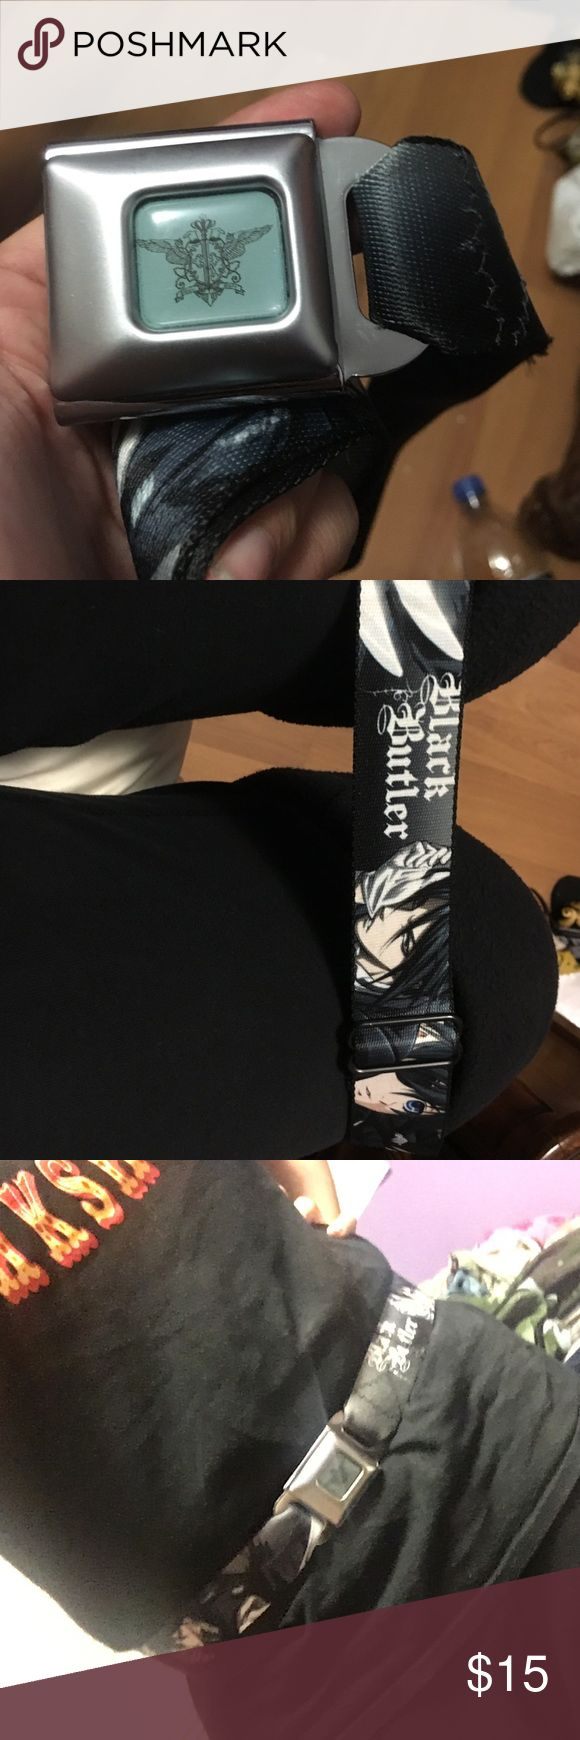 Black Butler belt Has Ceil and Sebastian on it. Seat belt buckle. Has Black Butler across it. Adjustable. Hot Topic Accessories Belts